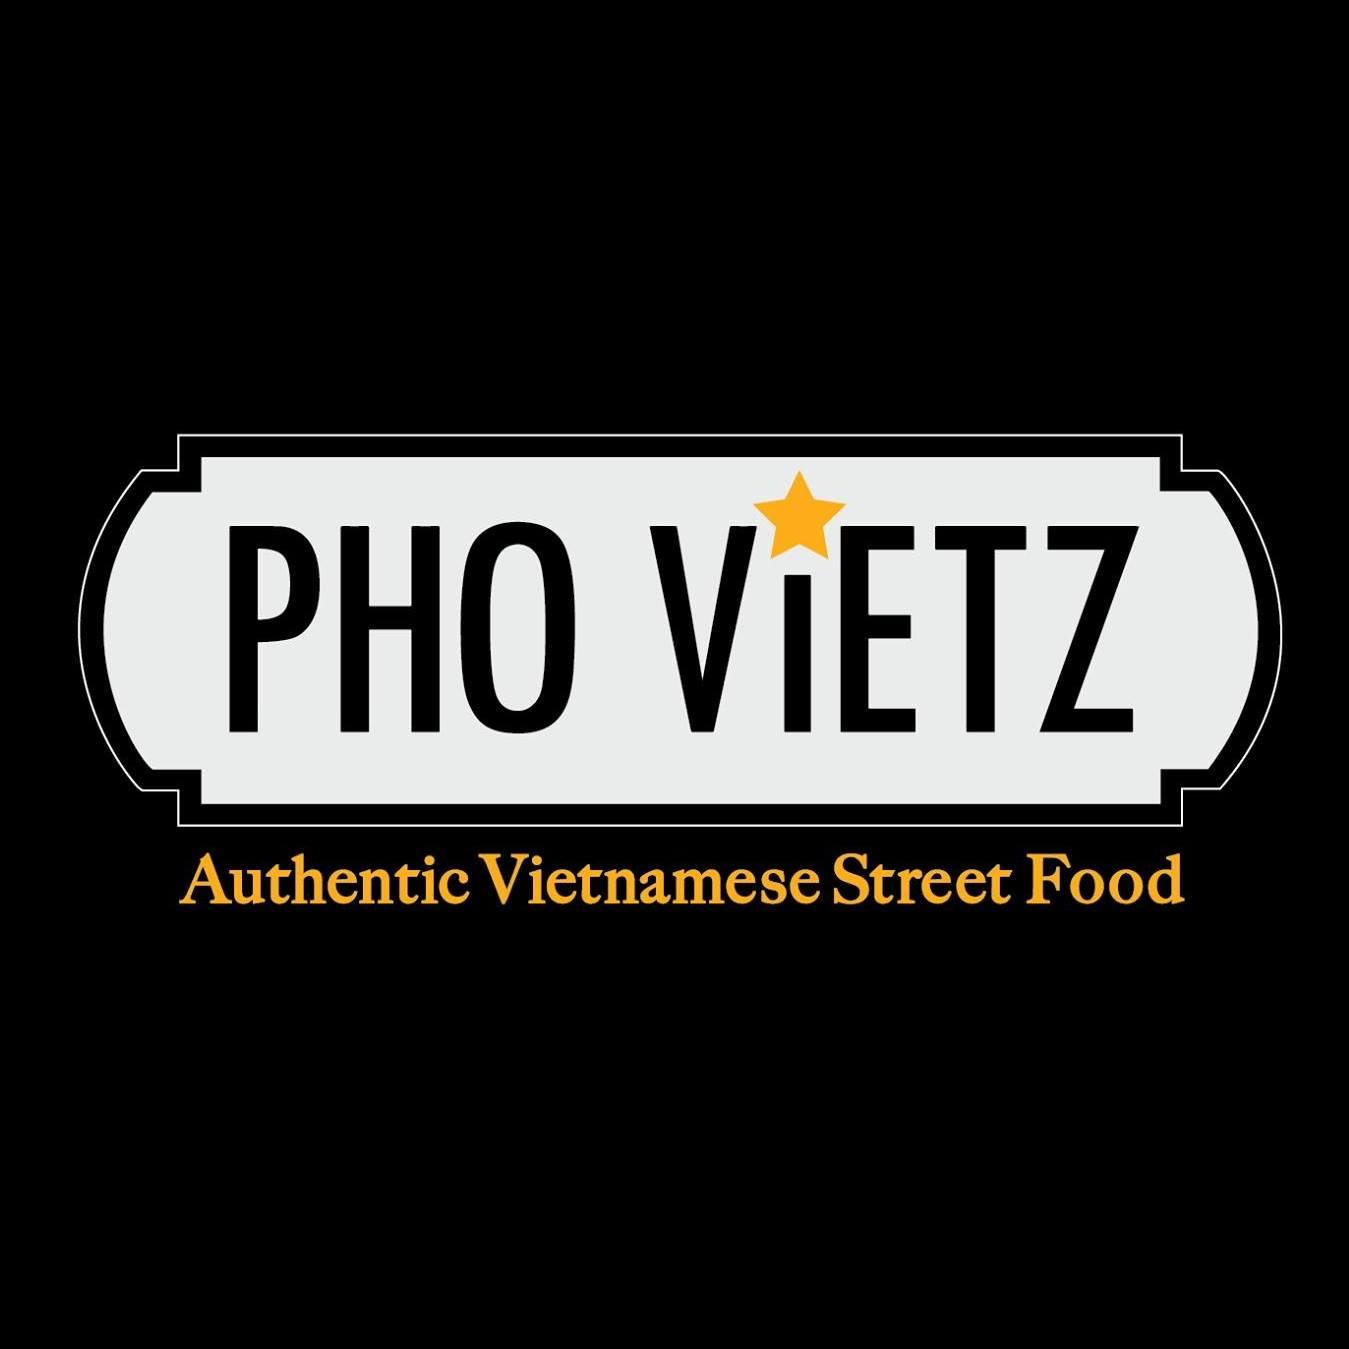 Pho VIetz